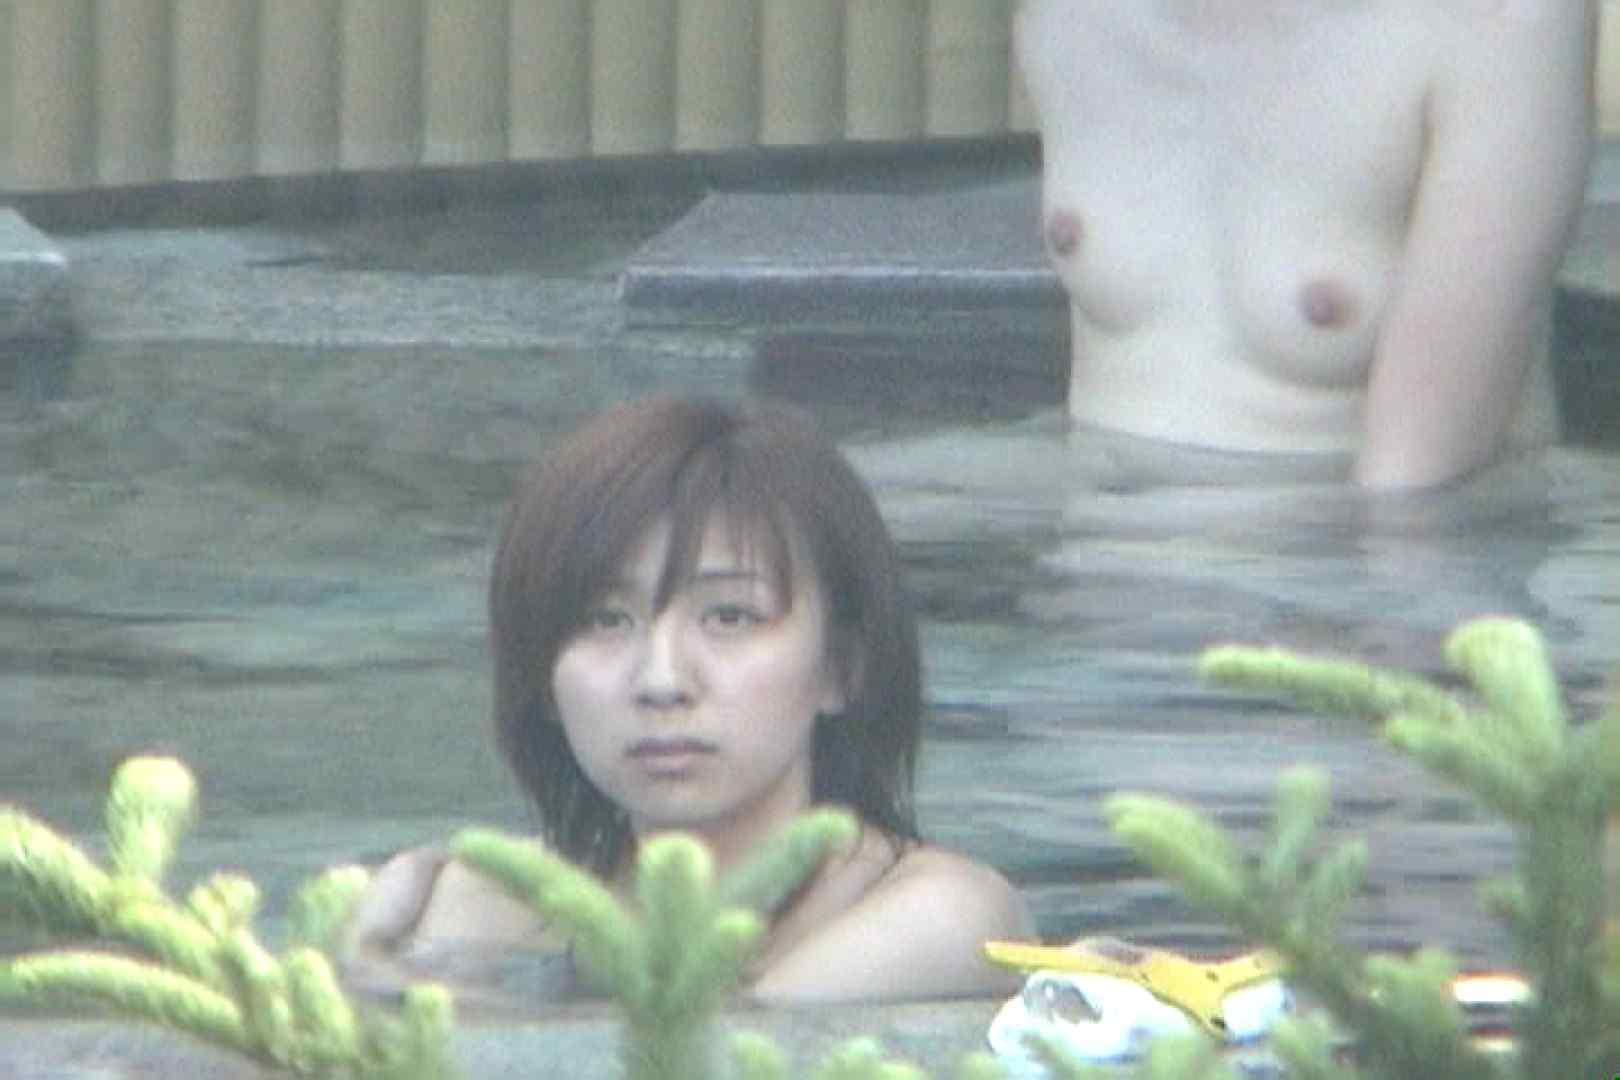 Aquaな露天風呂Vol.77【VIP限定】 露天風呂編  100PIX 62